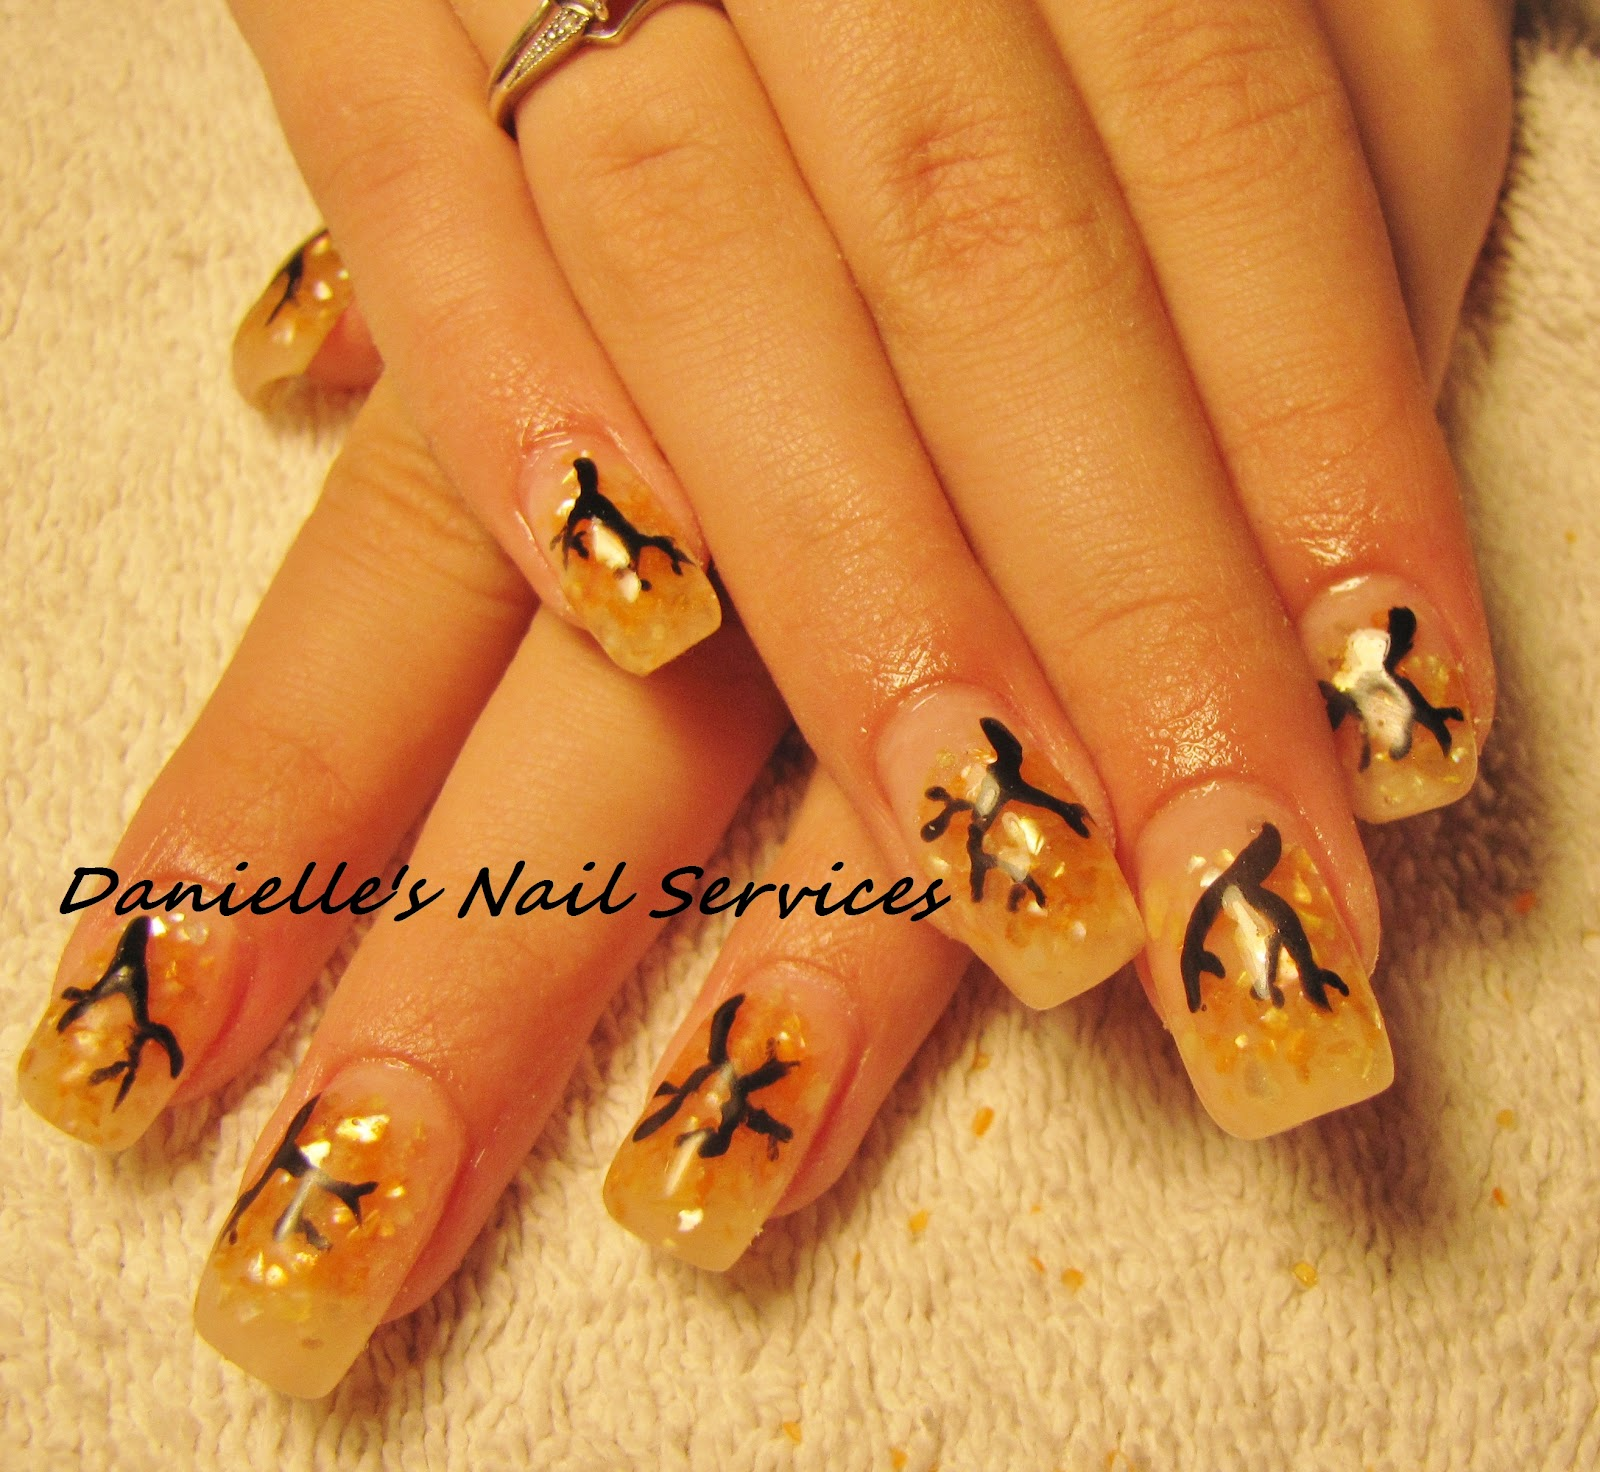 Danielle's Nail Services